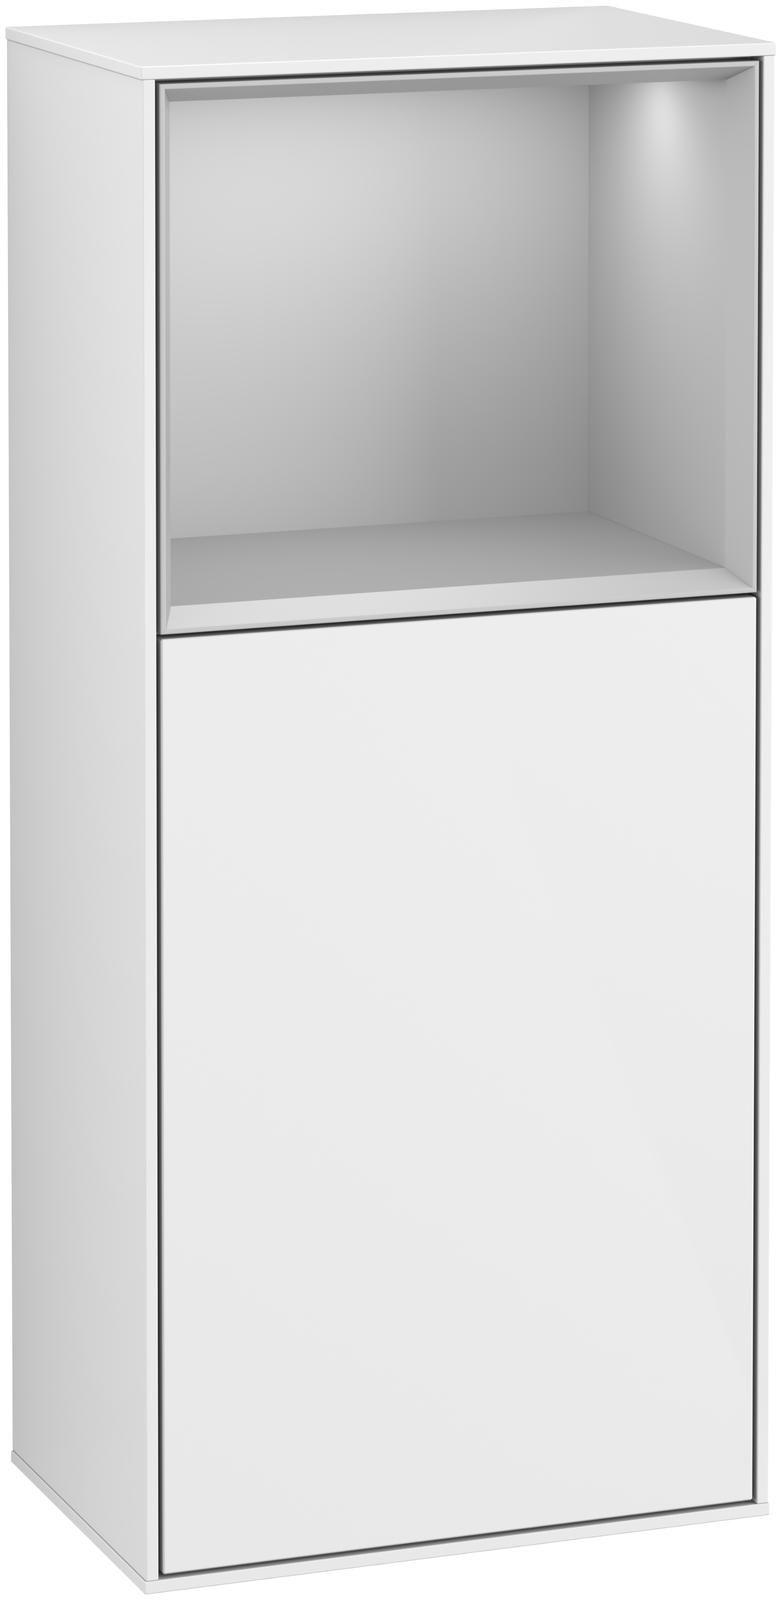 Villeroy & Boch Finion F52 Seitenschrank mit Regalelement 1 Tür Anschlag links LED-Beleuchtung B:41,8xH:93,6xT:27cm Front, Korpus: Glossy White Lack, Regal: Light Grey Matt F520GJGF